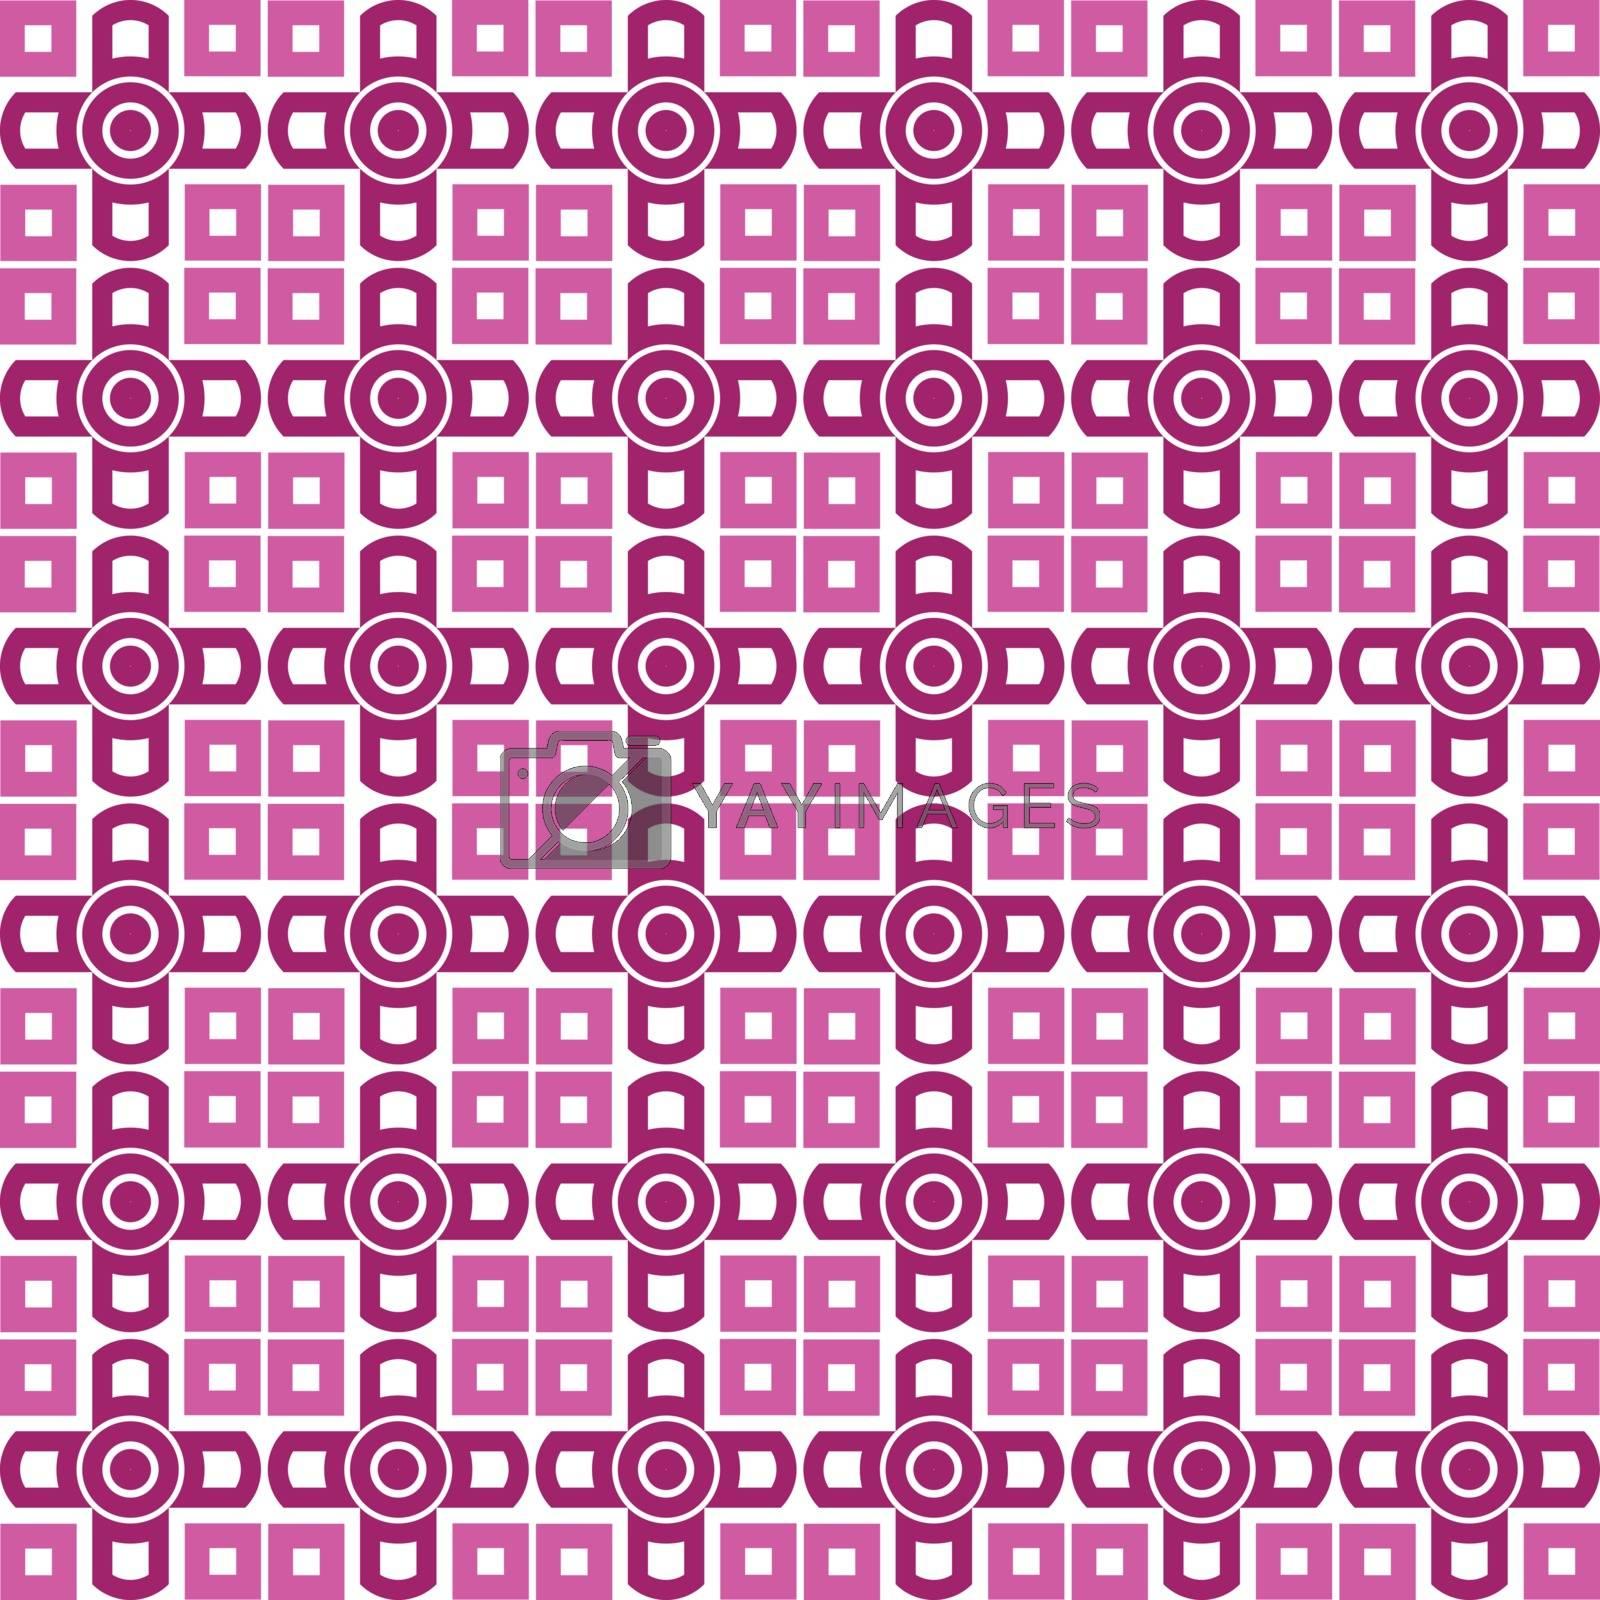 Seamless vector wallpaper. purple geometric repetitive print